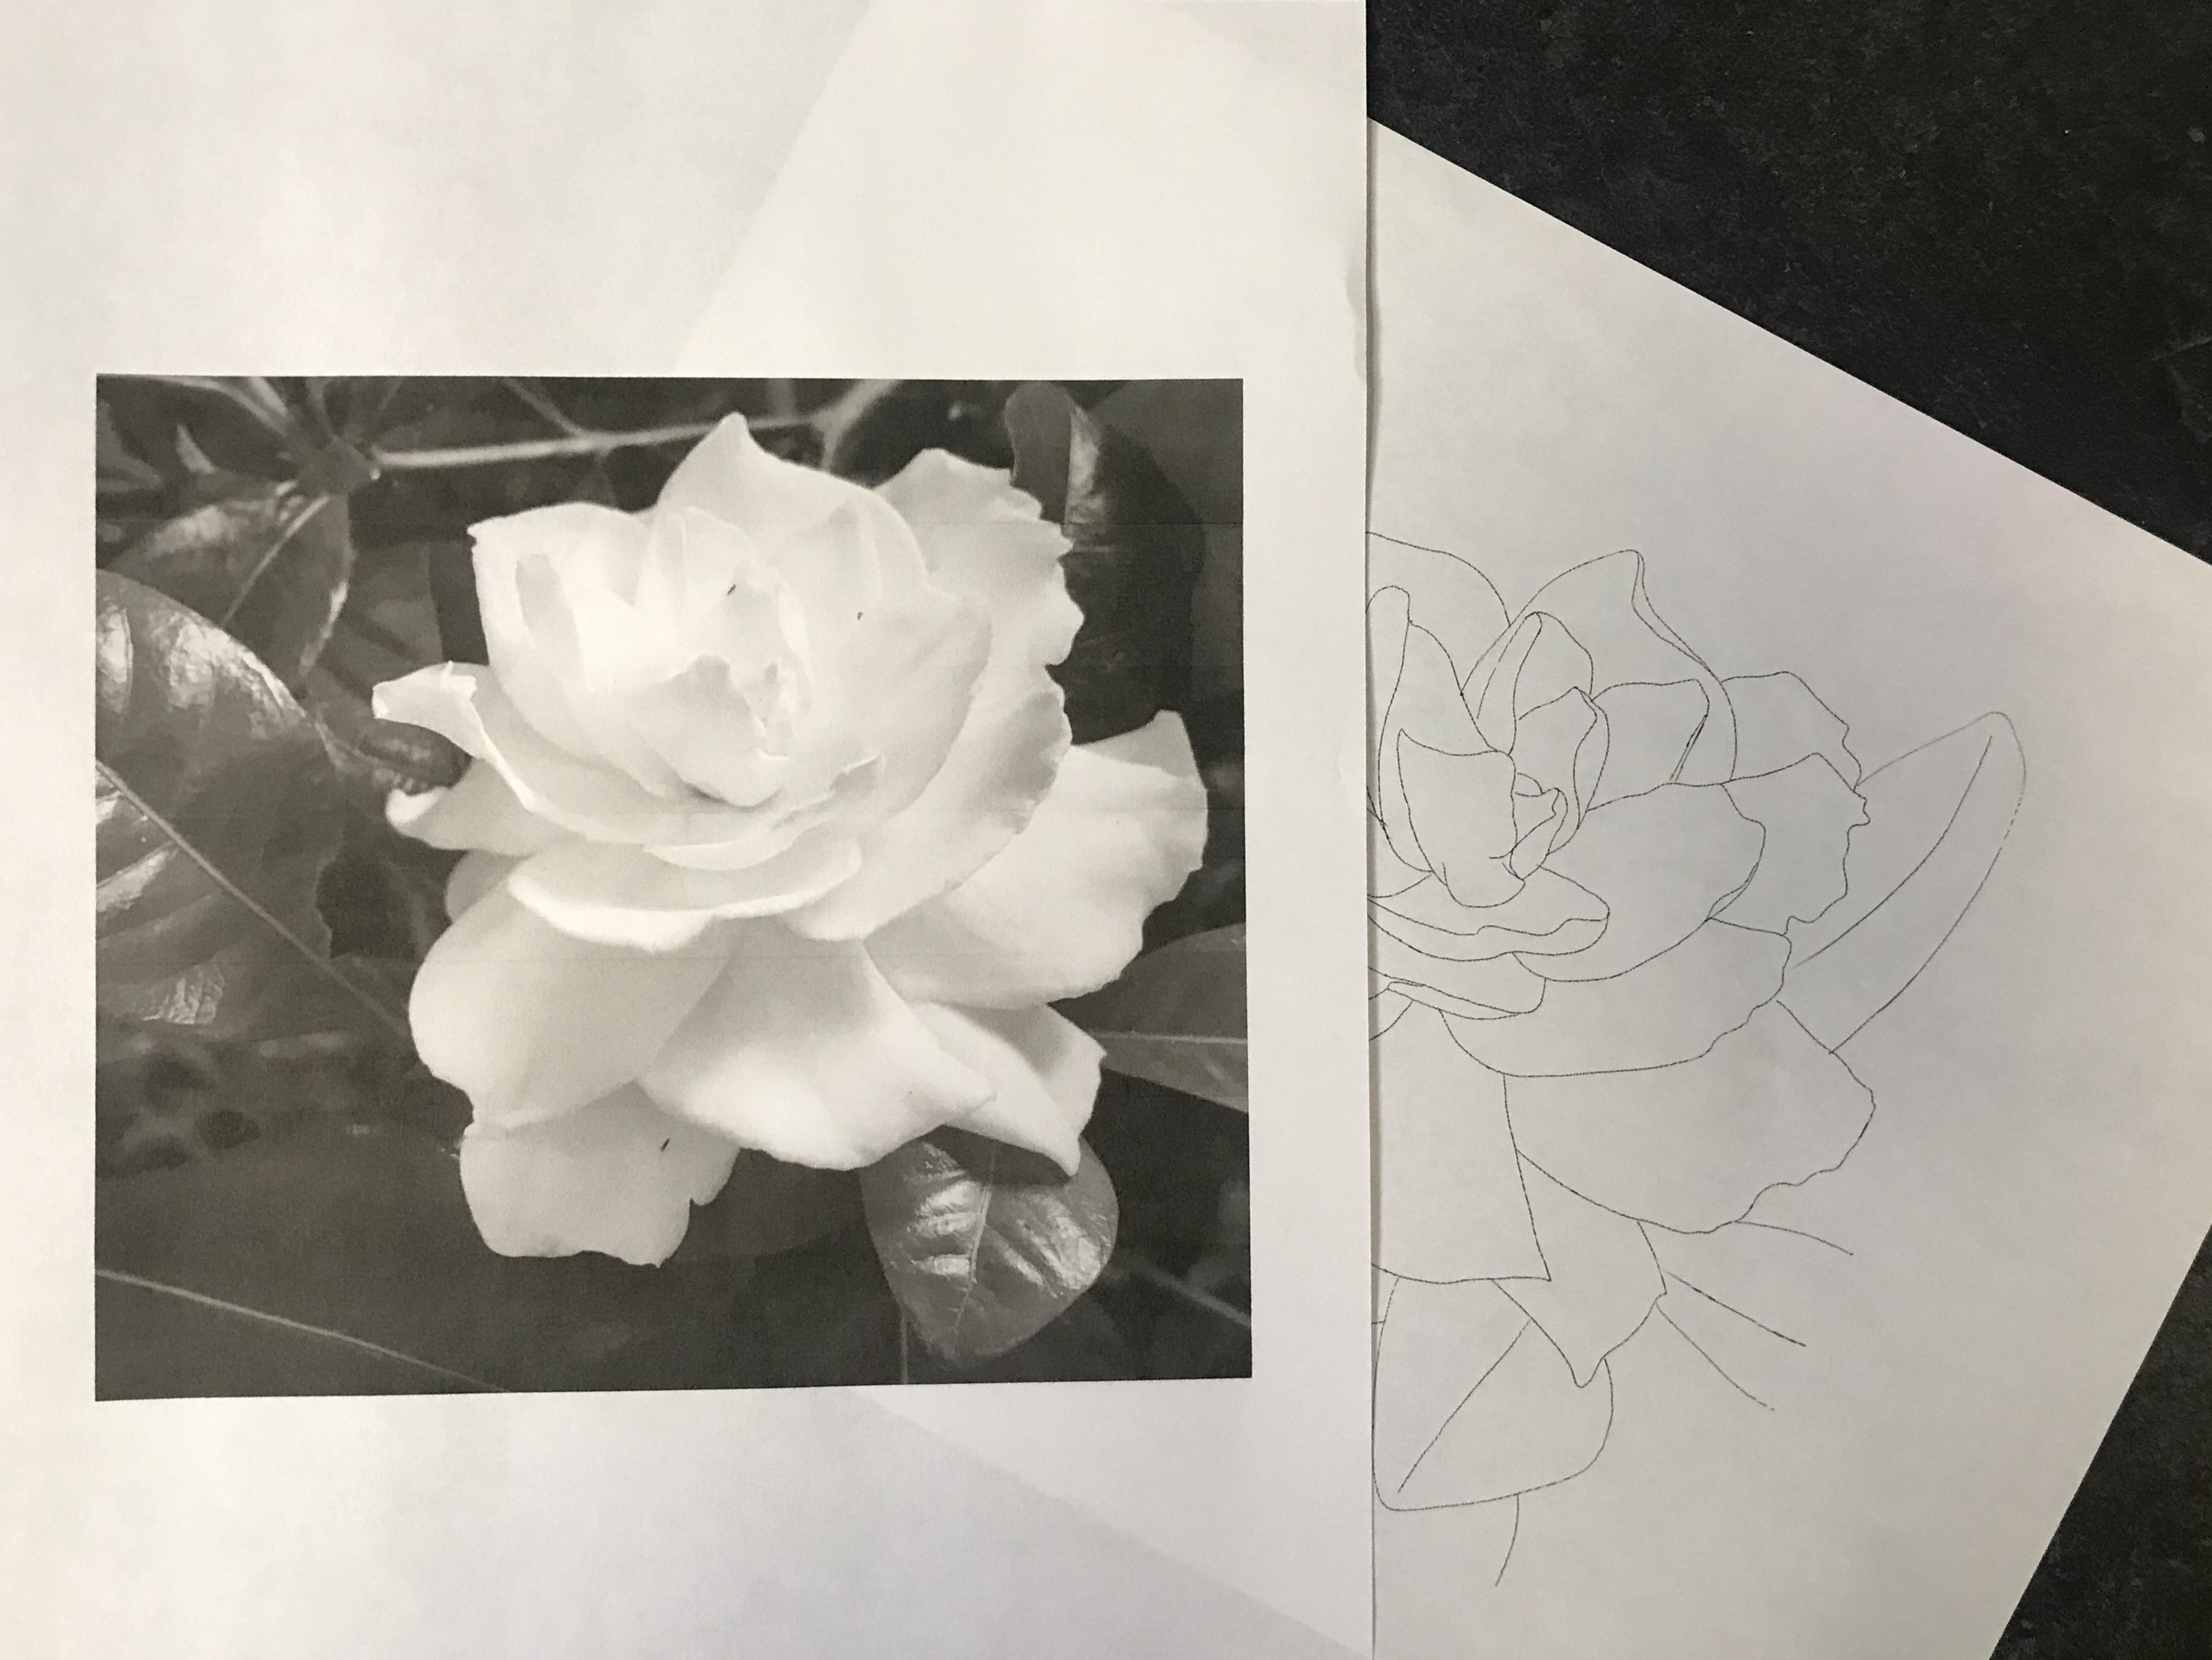 lallen_tattoo - Gardenia 6